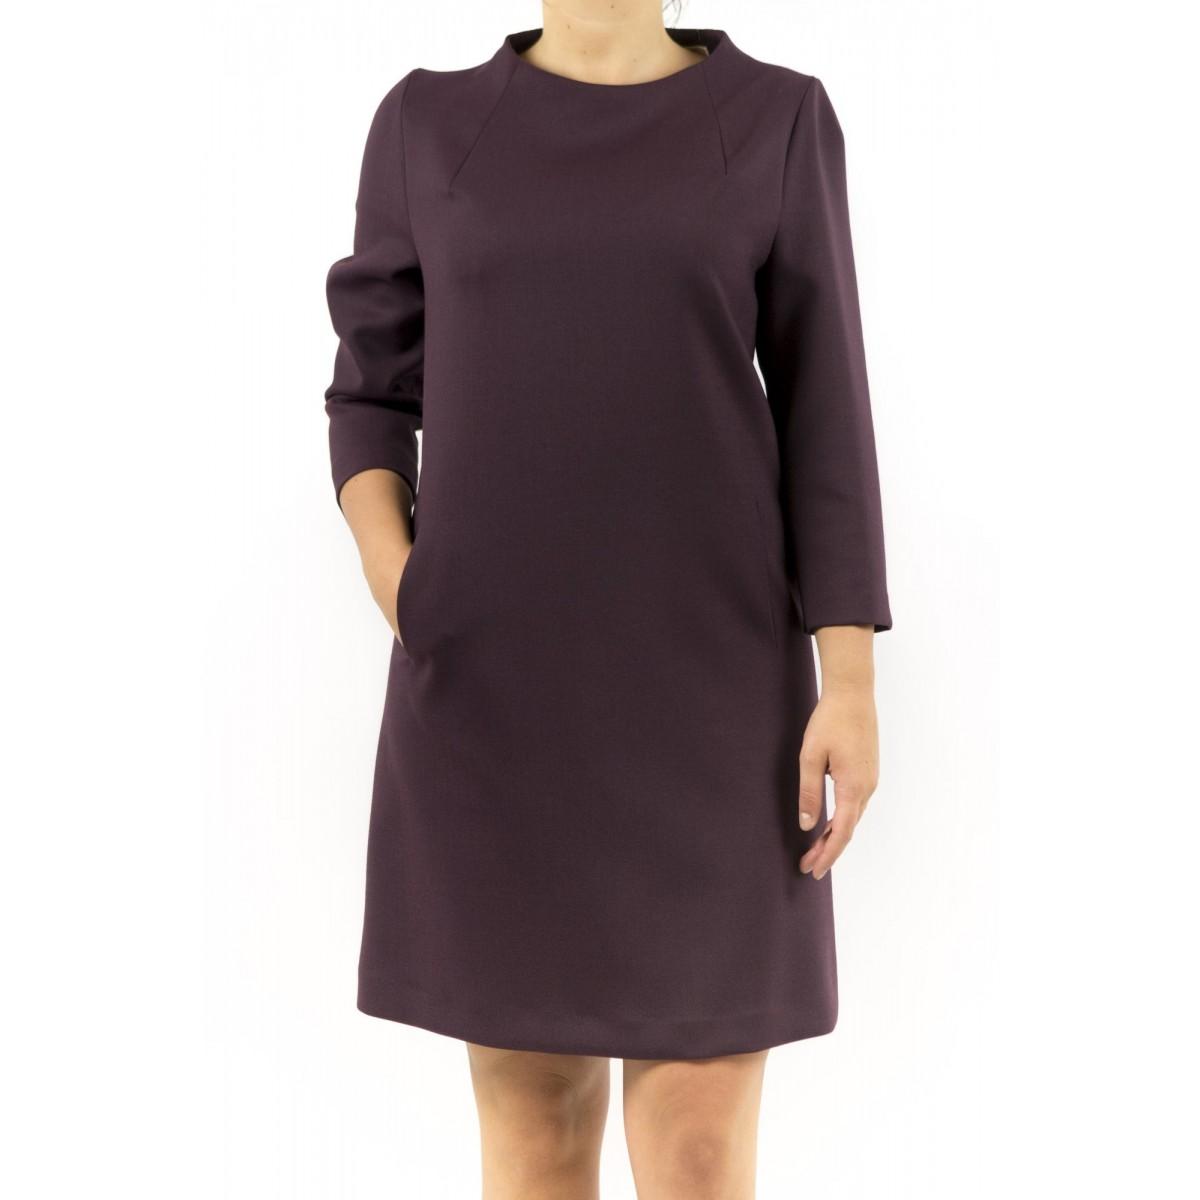 Kleidung Erika Cavallini - Semicouture - P5I023